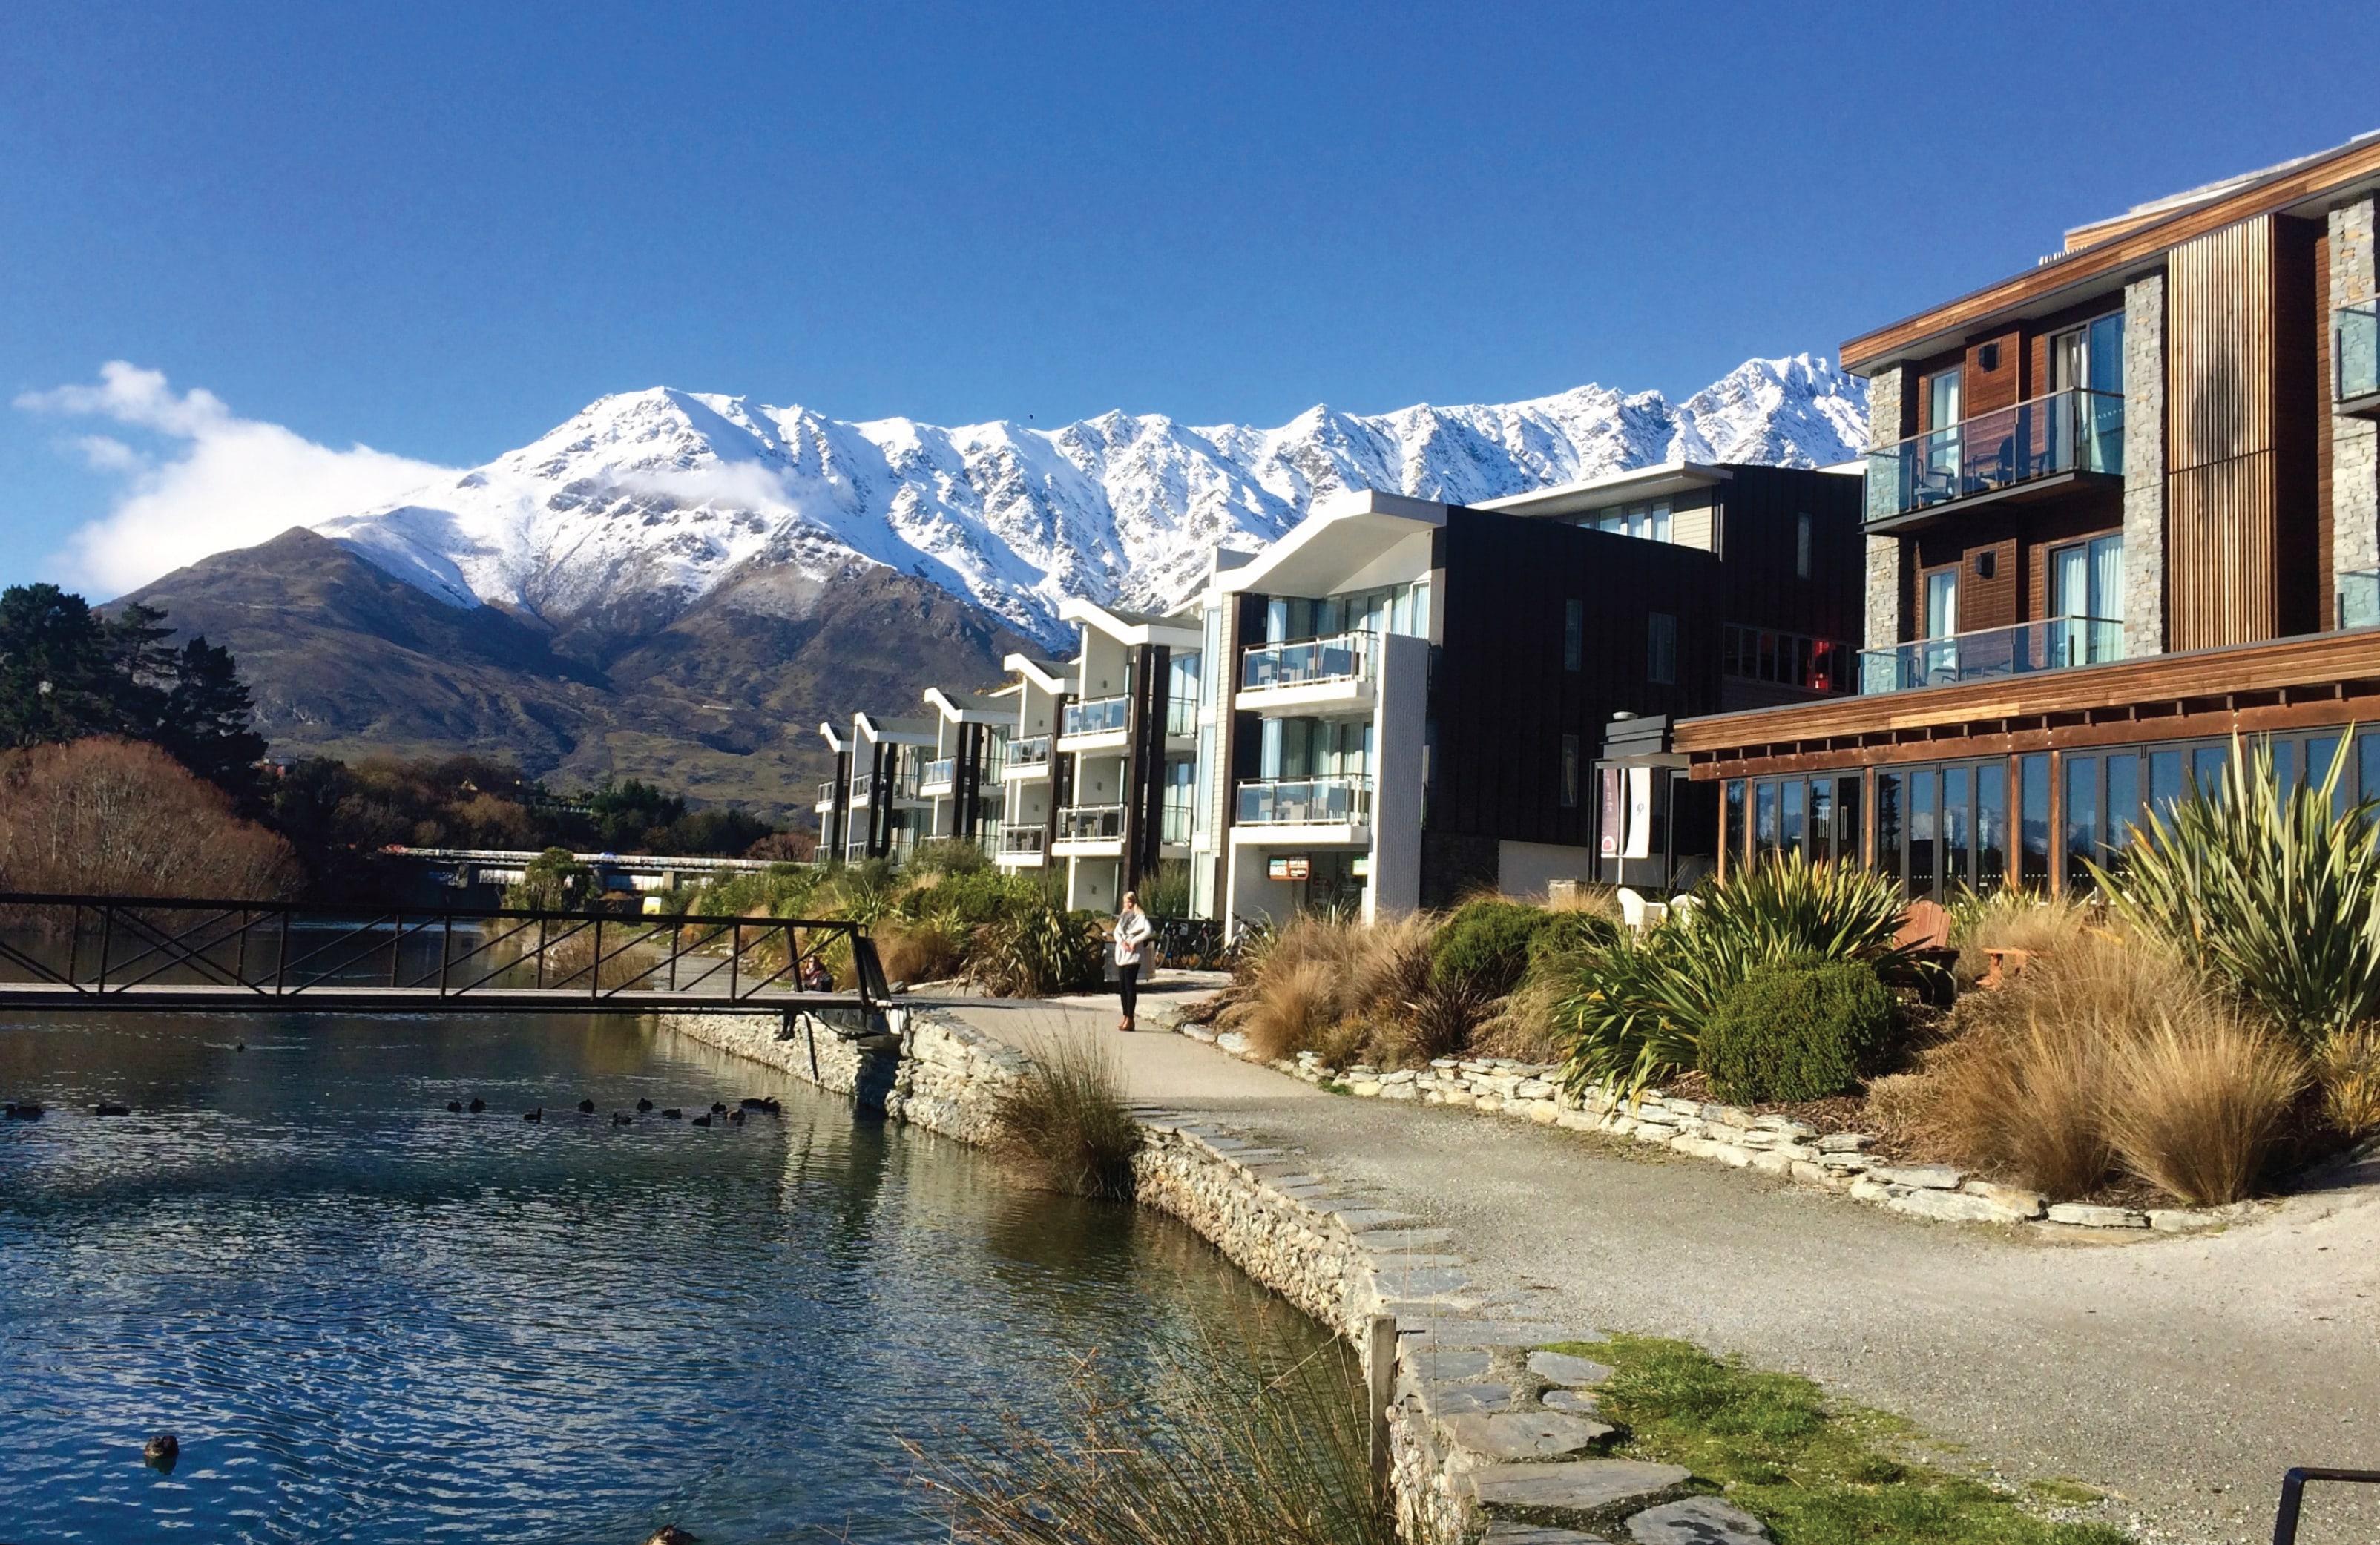 NZBSA accommodation